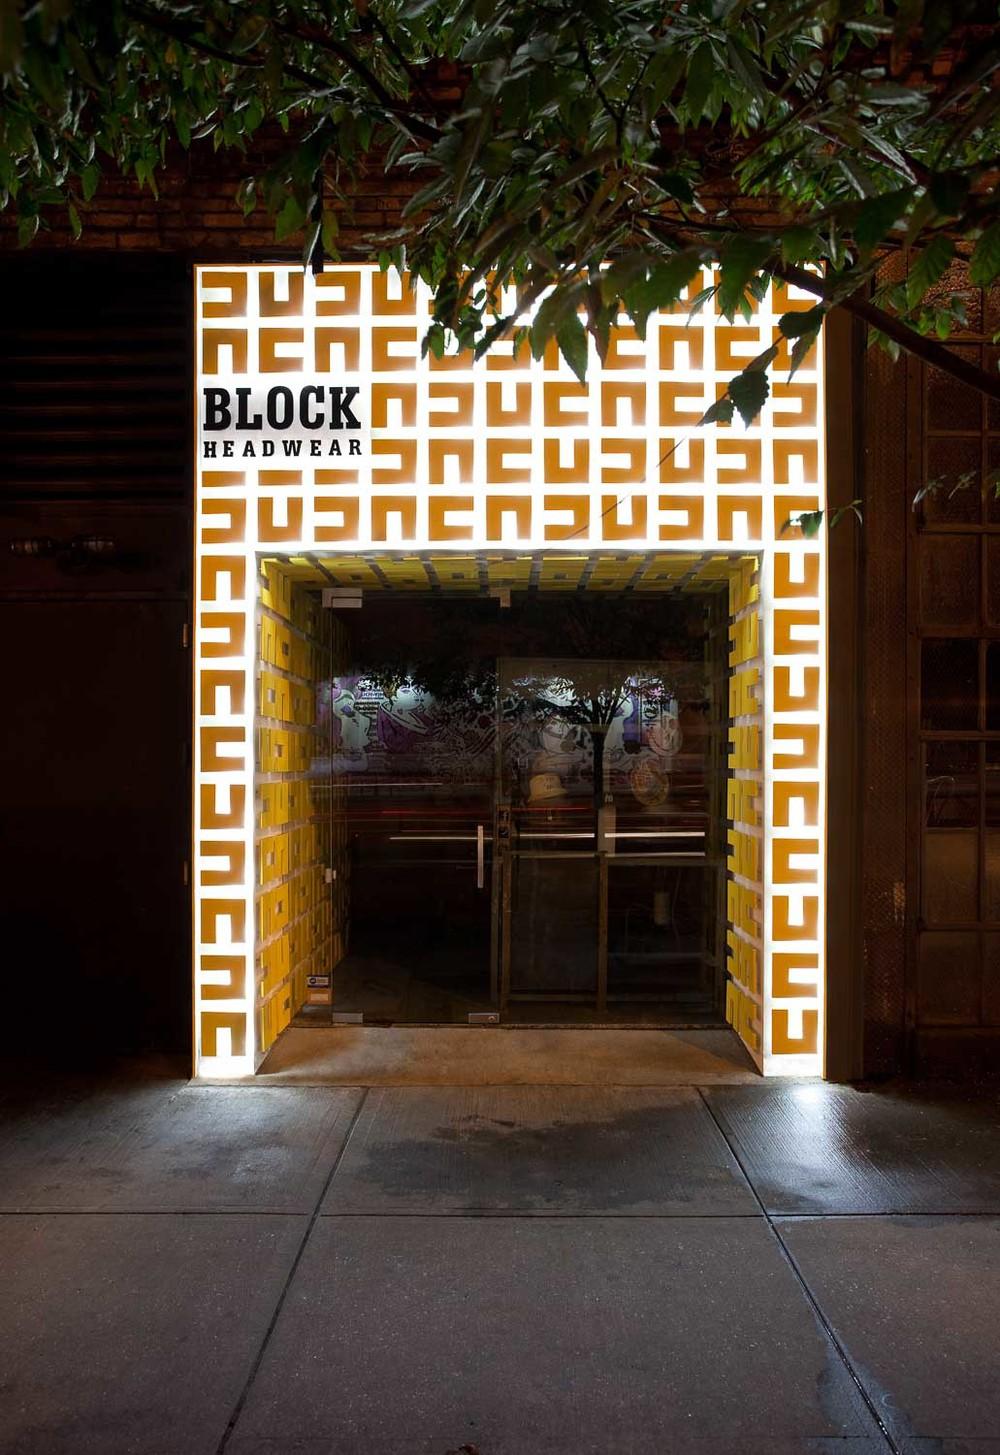 Blcok Headware Storefront Design